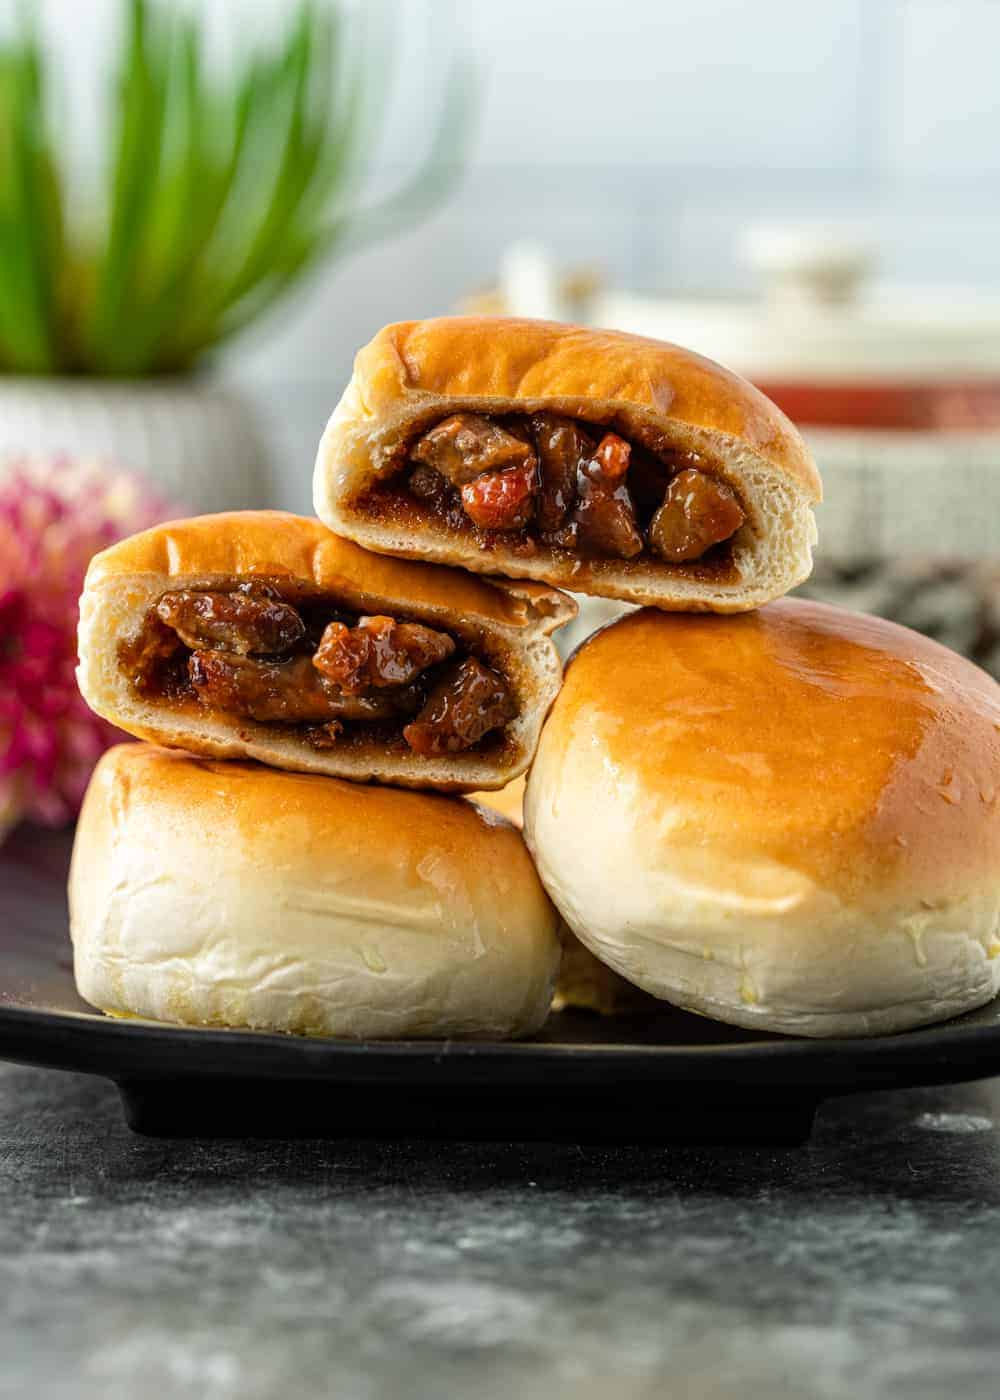 side view photo shows instead of char siu bao (Chinese bbq pork buns)